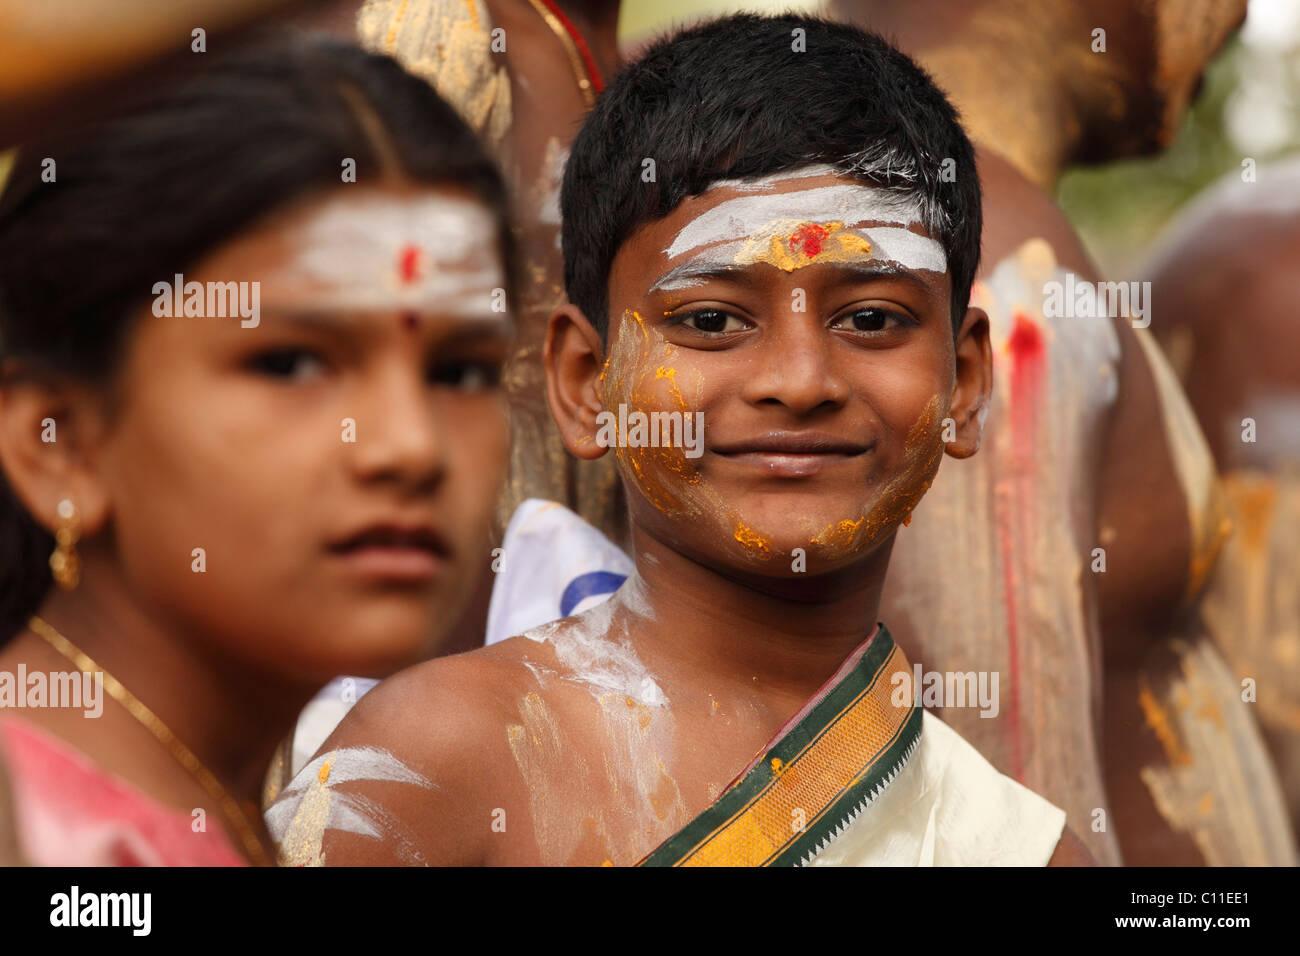 Thaipusam festival in Tenkasi, Tamil Nadu, Tamilnadu, South India, India, Asia - Stock Image